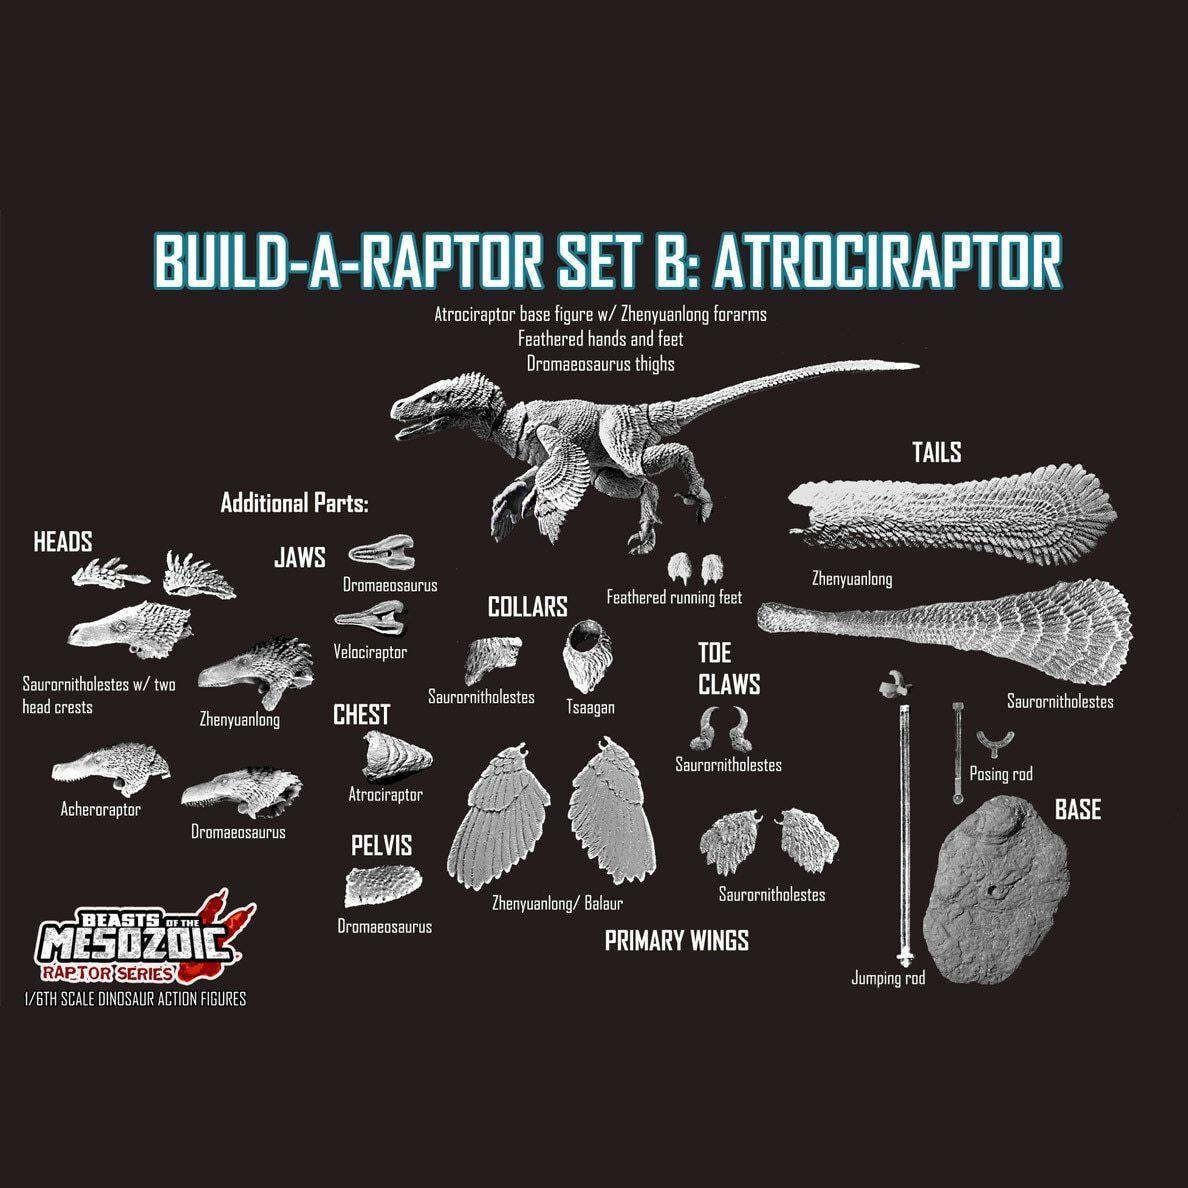 Beasts of the Mesozoic Build-a-Raptor Set B Atrociraptor 1 6 Scale Figurine